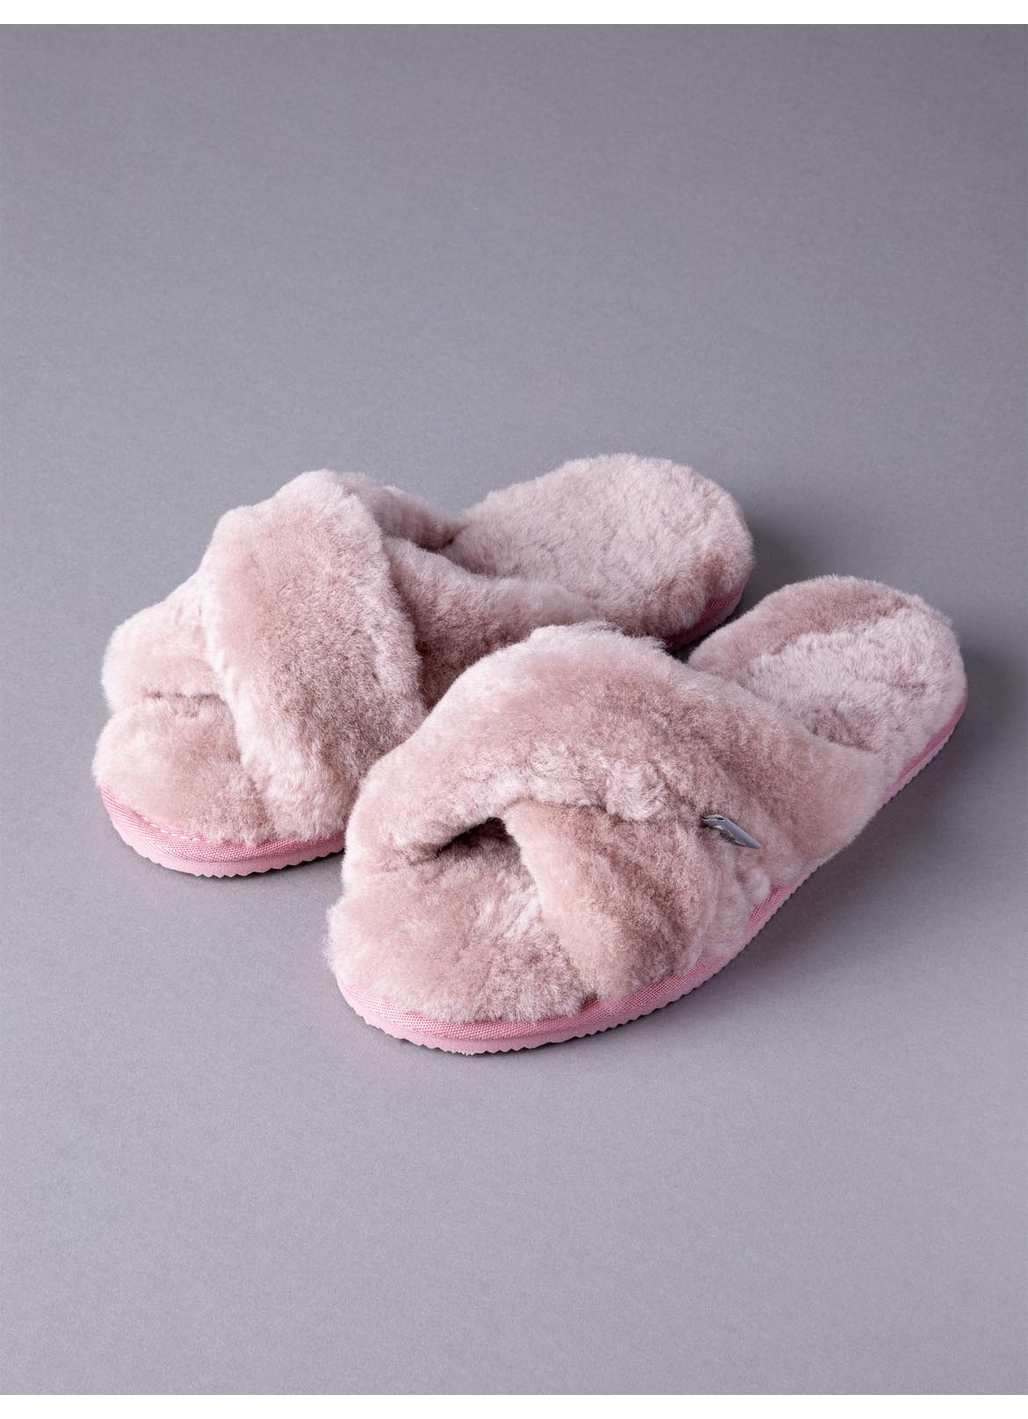 Ladies' Sheepskin Cross-Over Mules in Pink